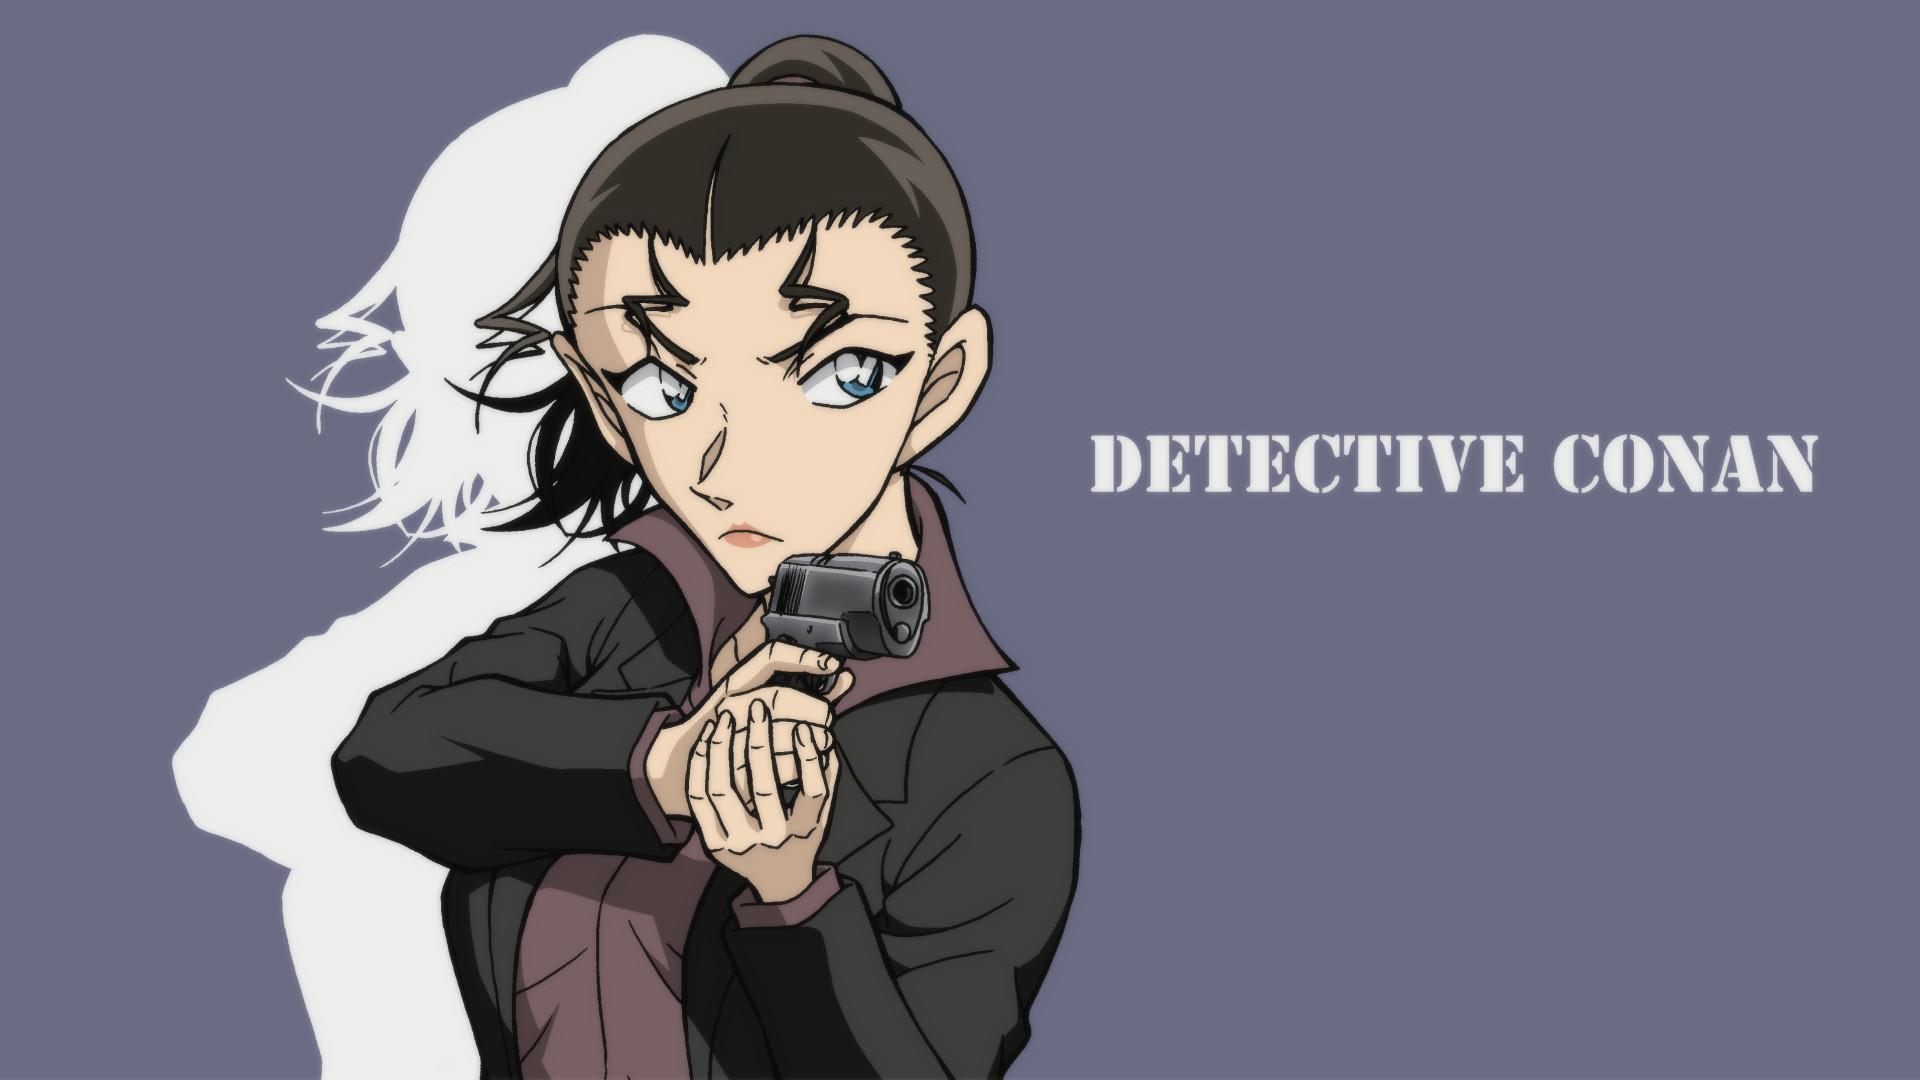 Detective Conan Shinichi And Kaito Kid Wallpaper ... - photo#3